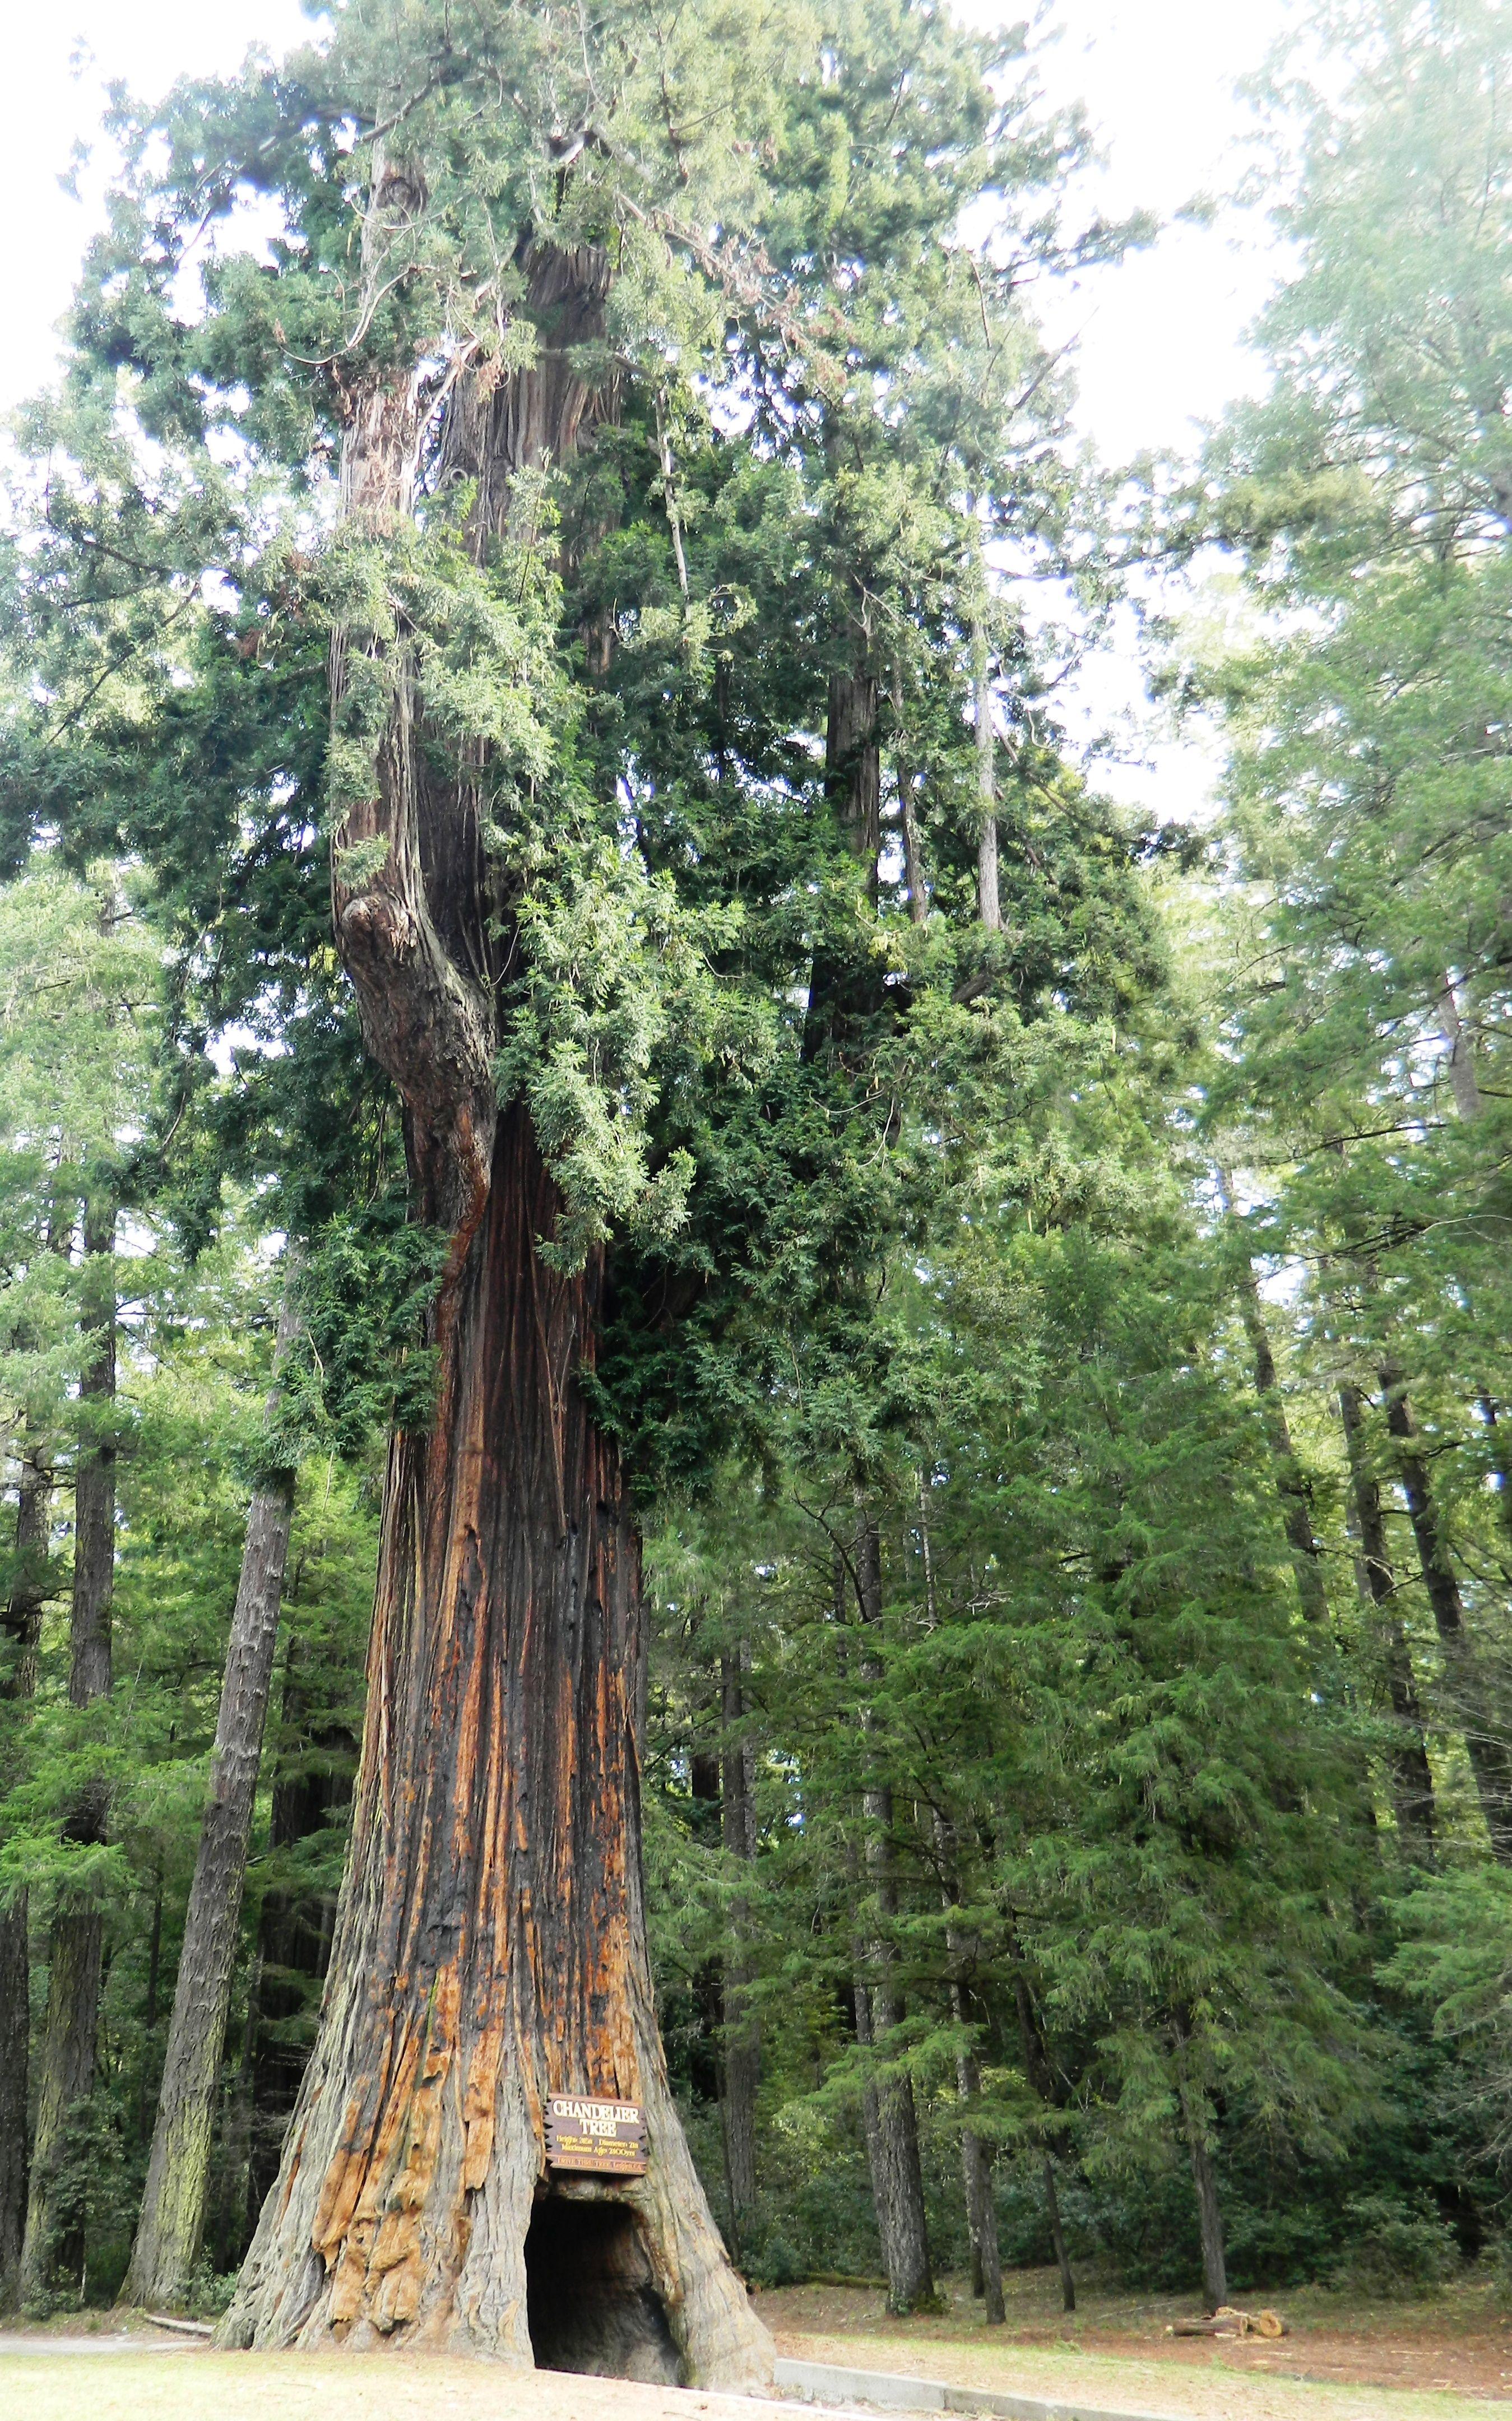 Chandelier Drive-Thru Tree in Leggett, CA | Great pictures ...